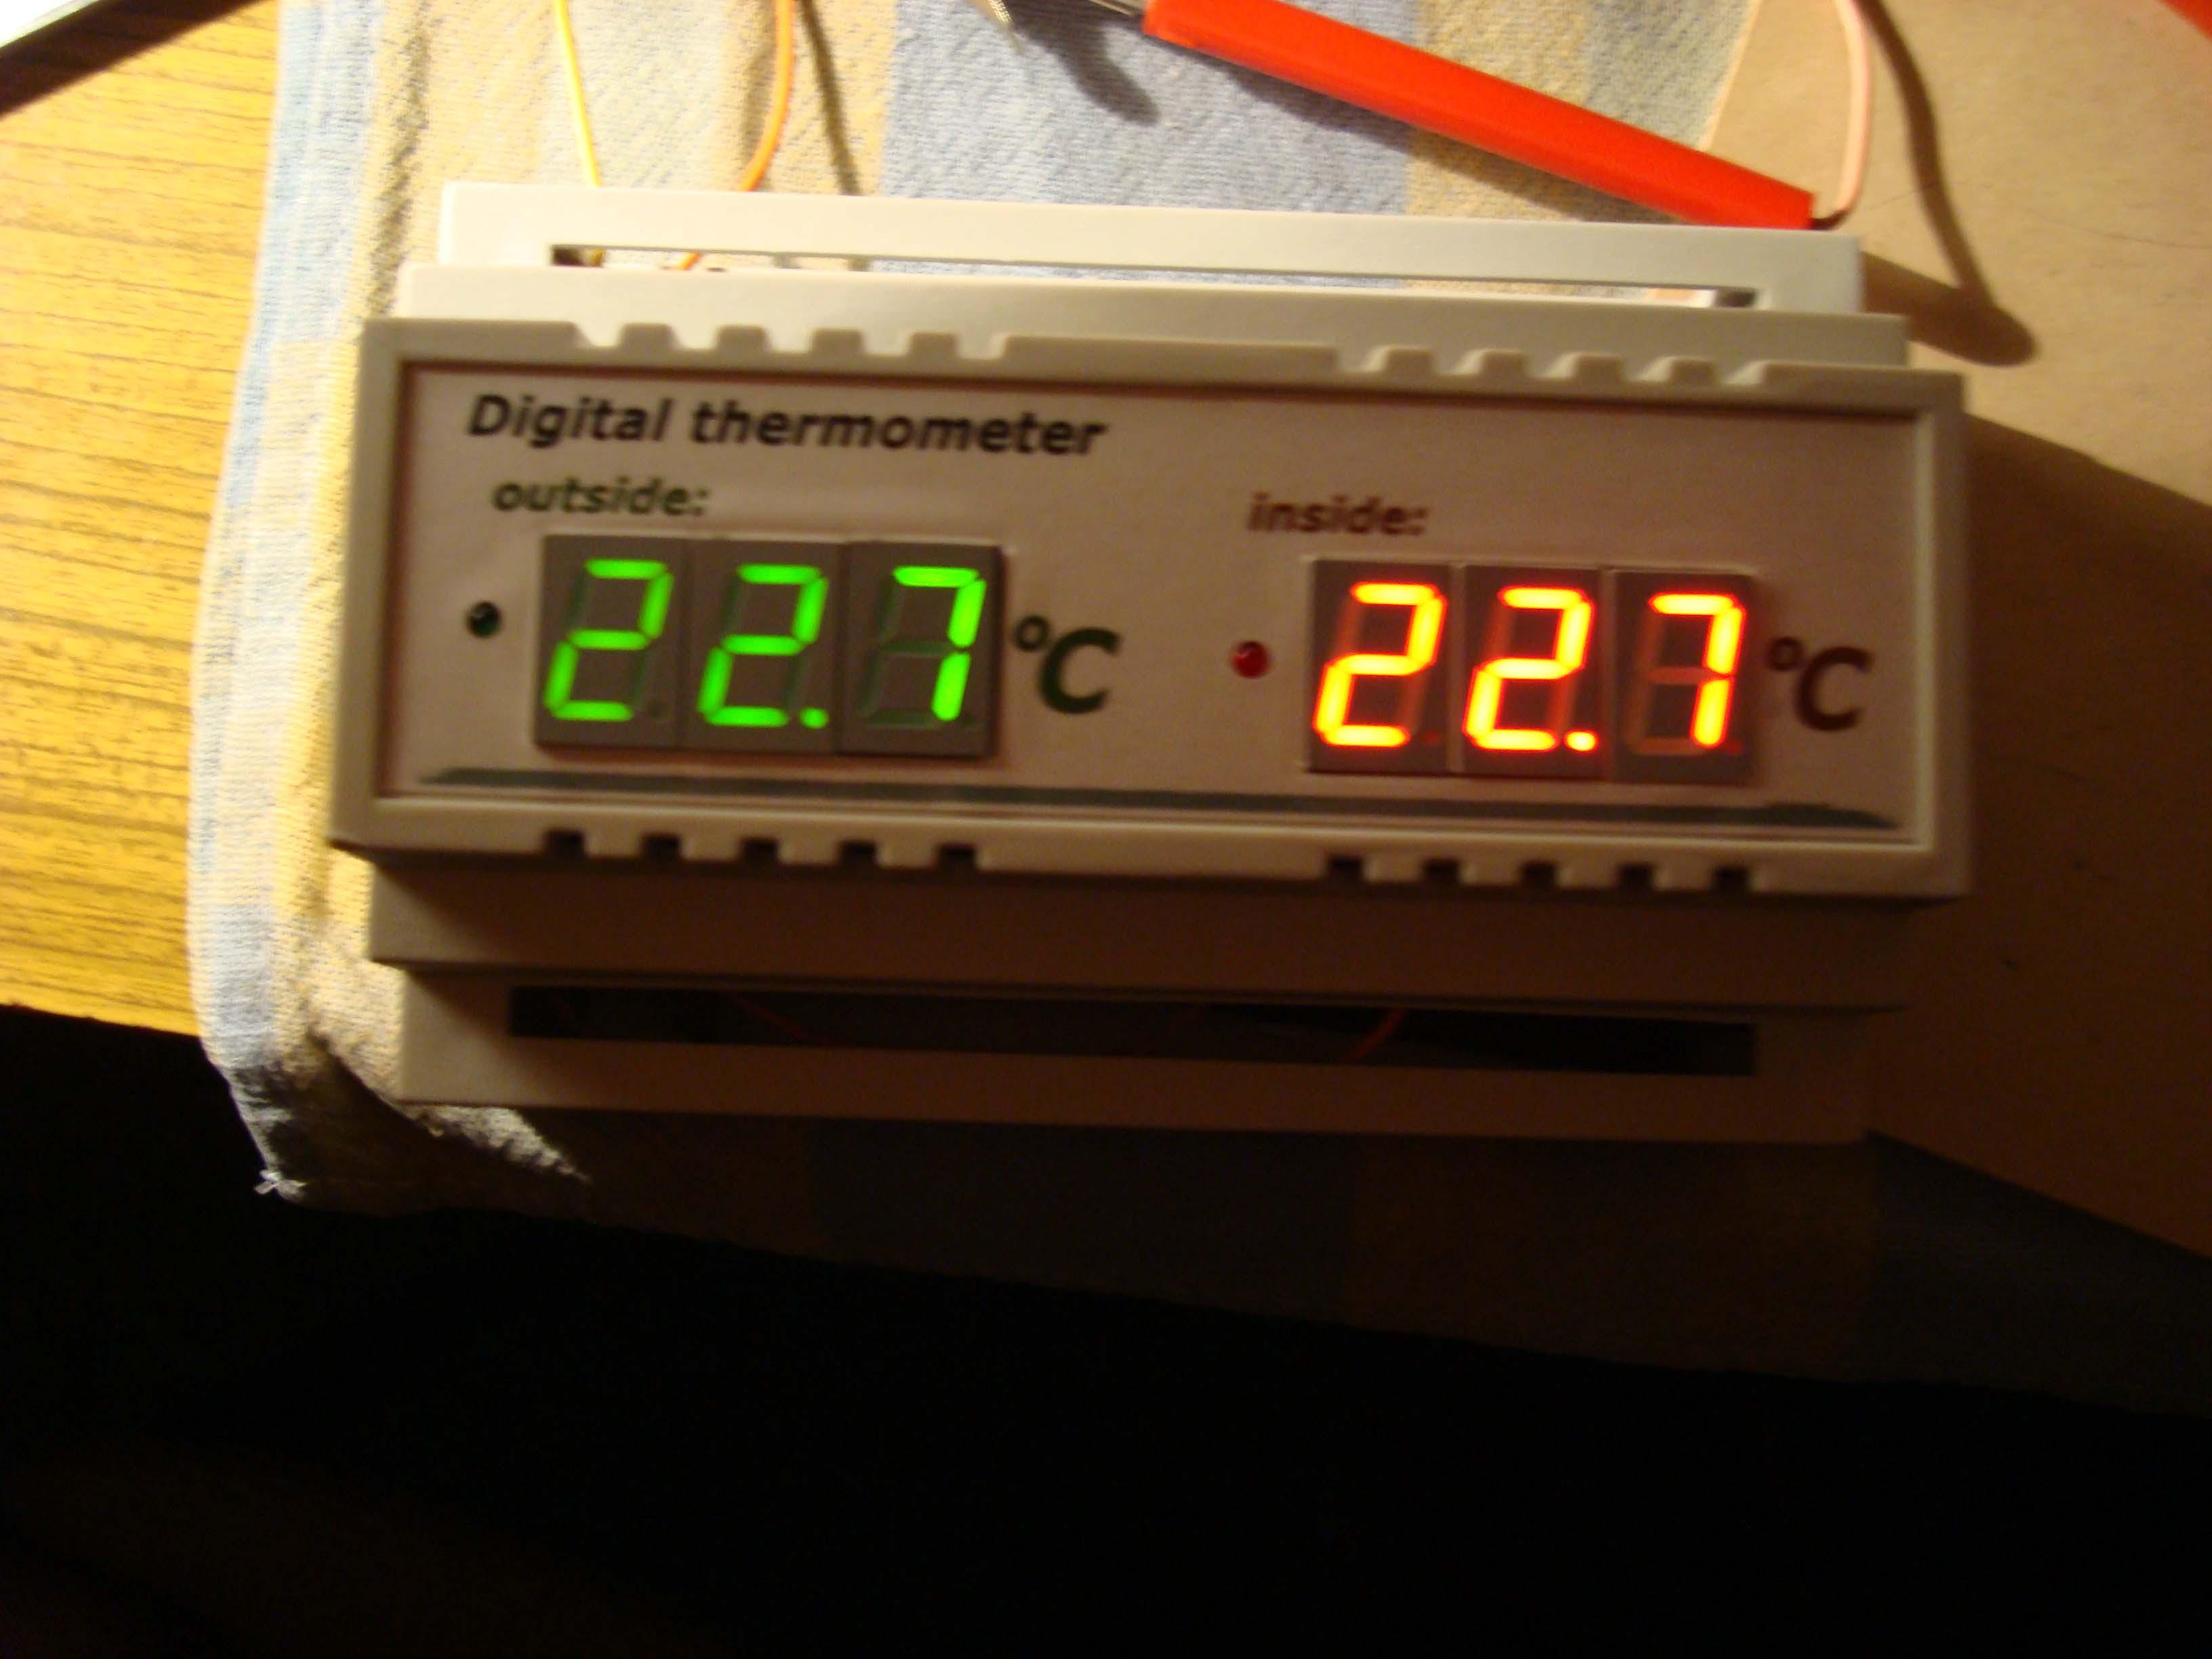 Termometr dwupunktowy na szyn� TH-35 (attiny 2313 ds18b20)